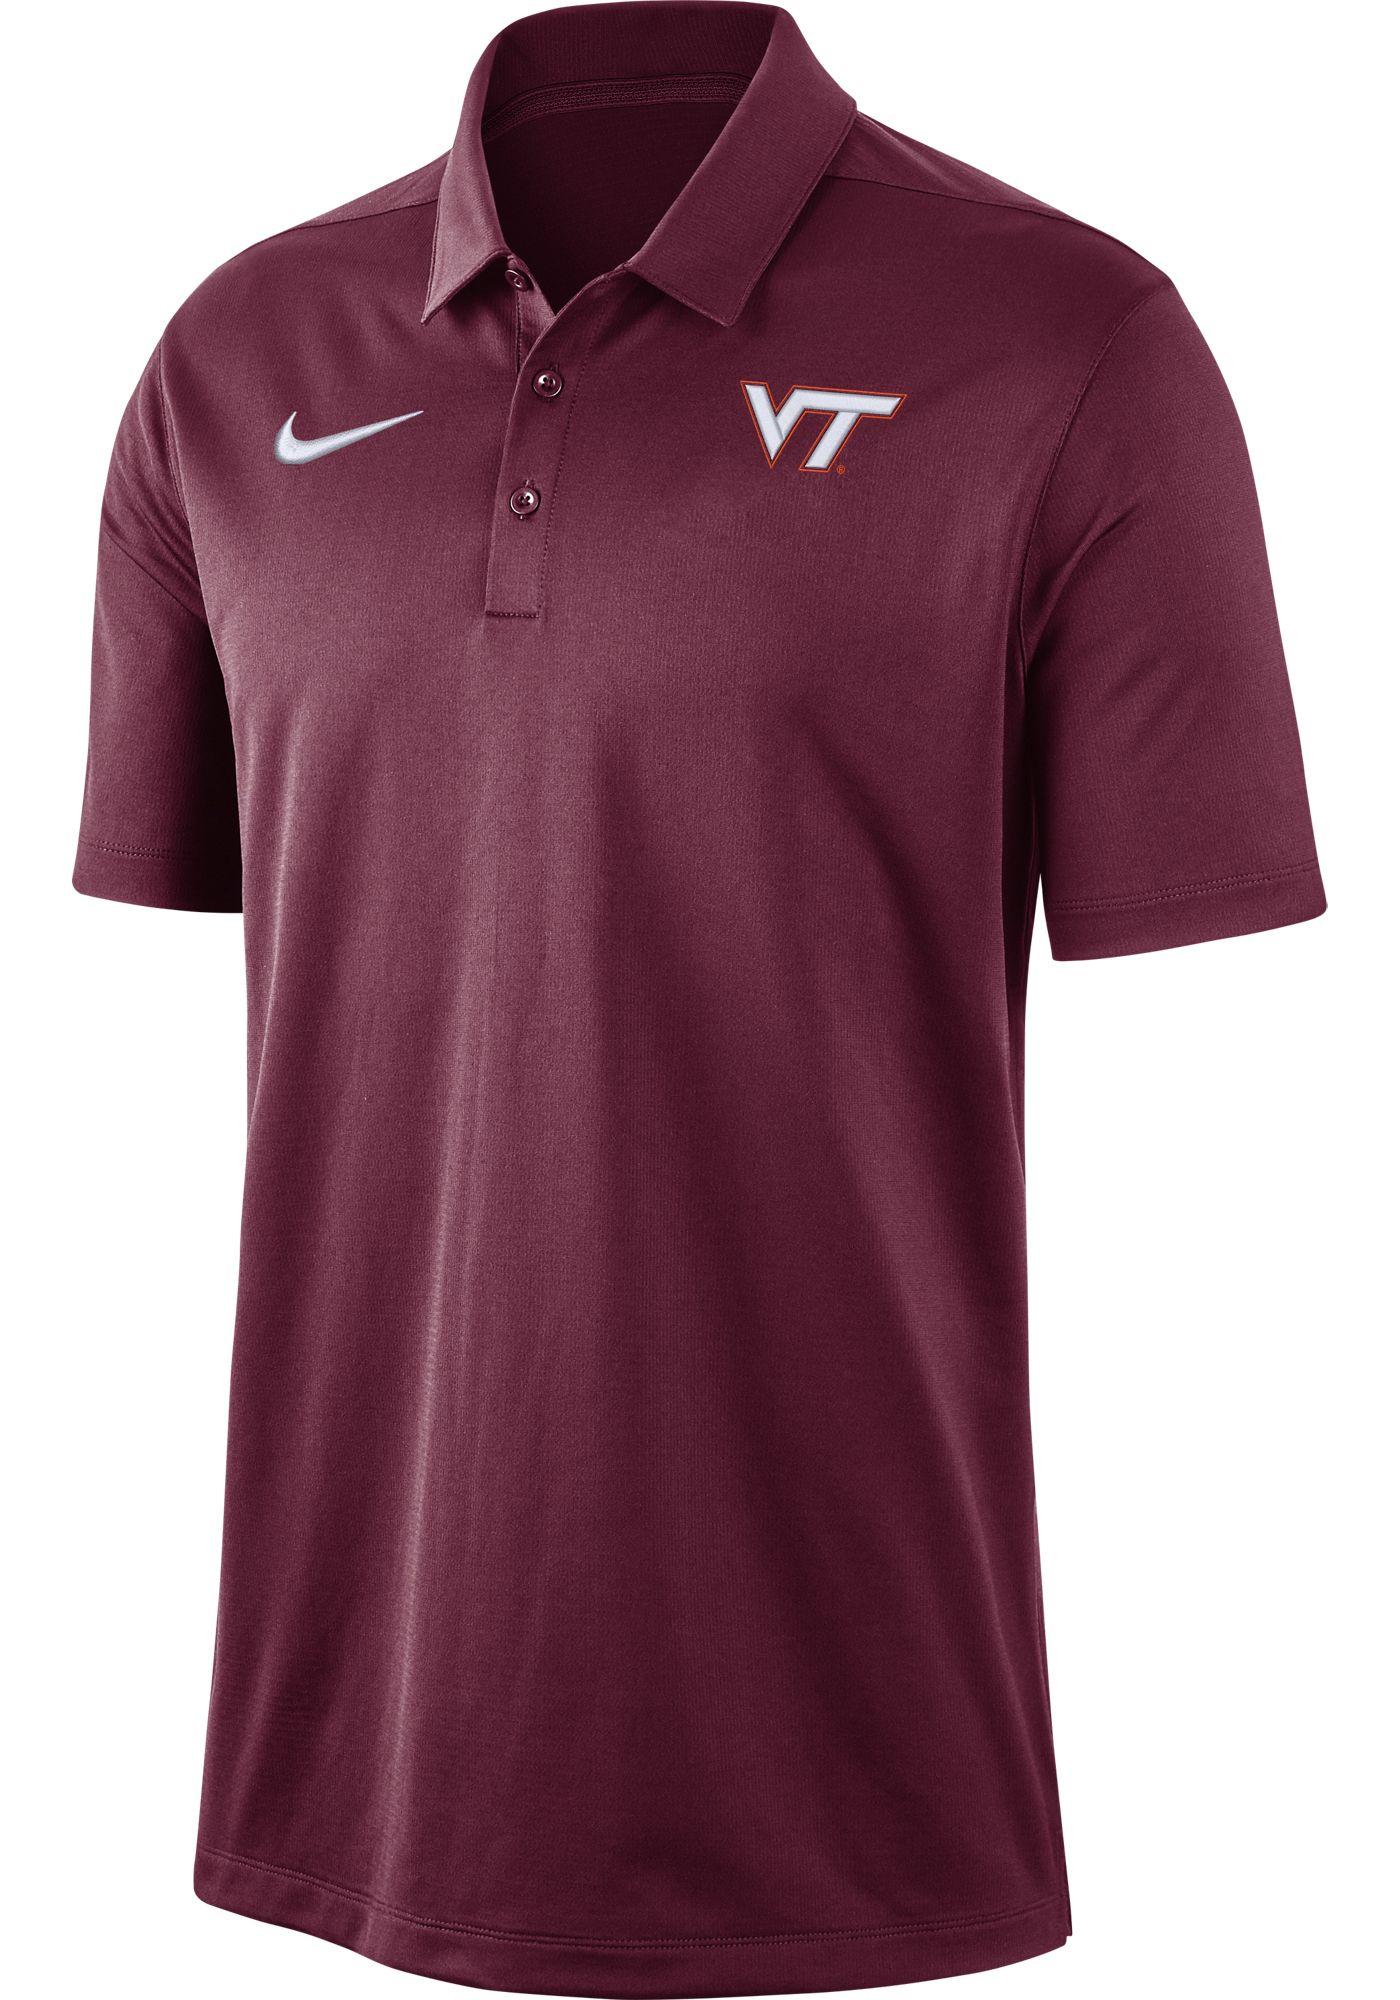 Nike Men's Virginia Tech Hokies Maroon Dri-FIT Franchise Polo